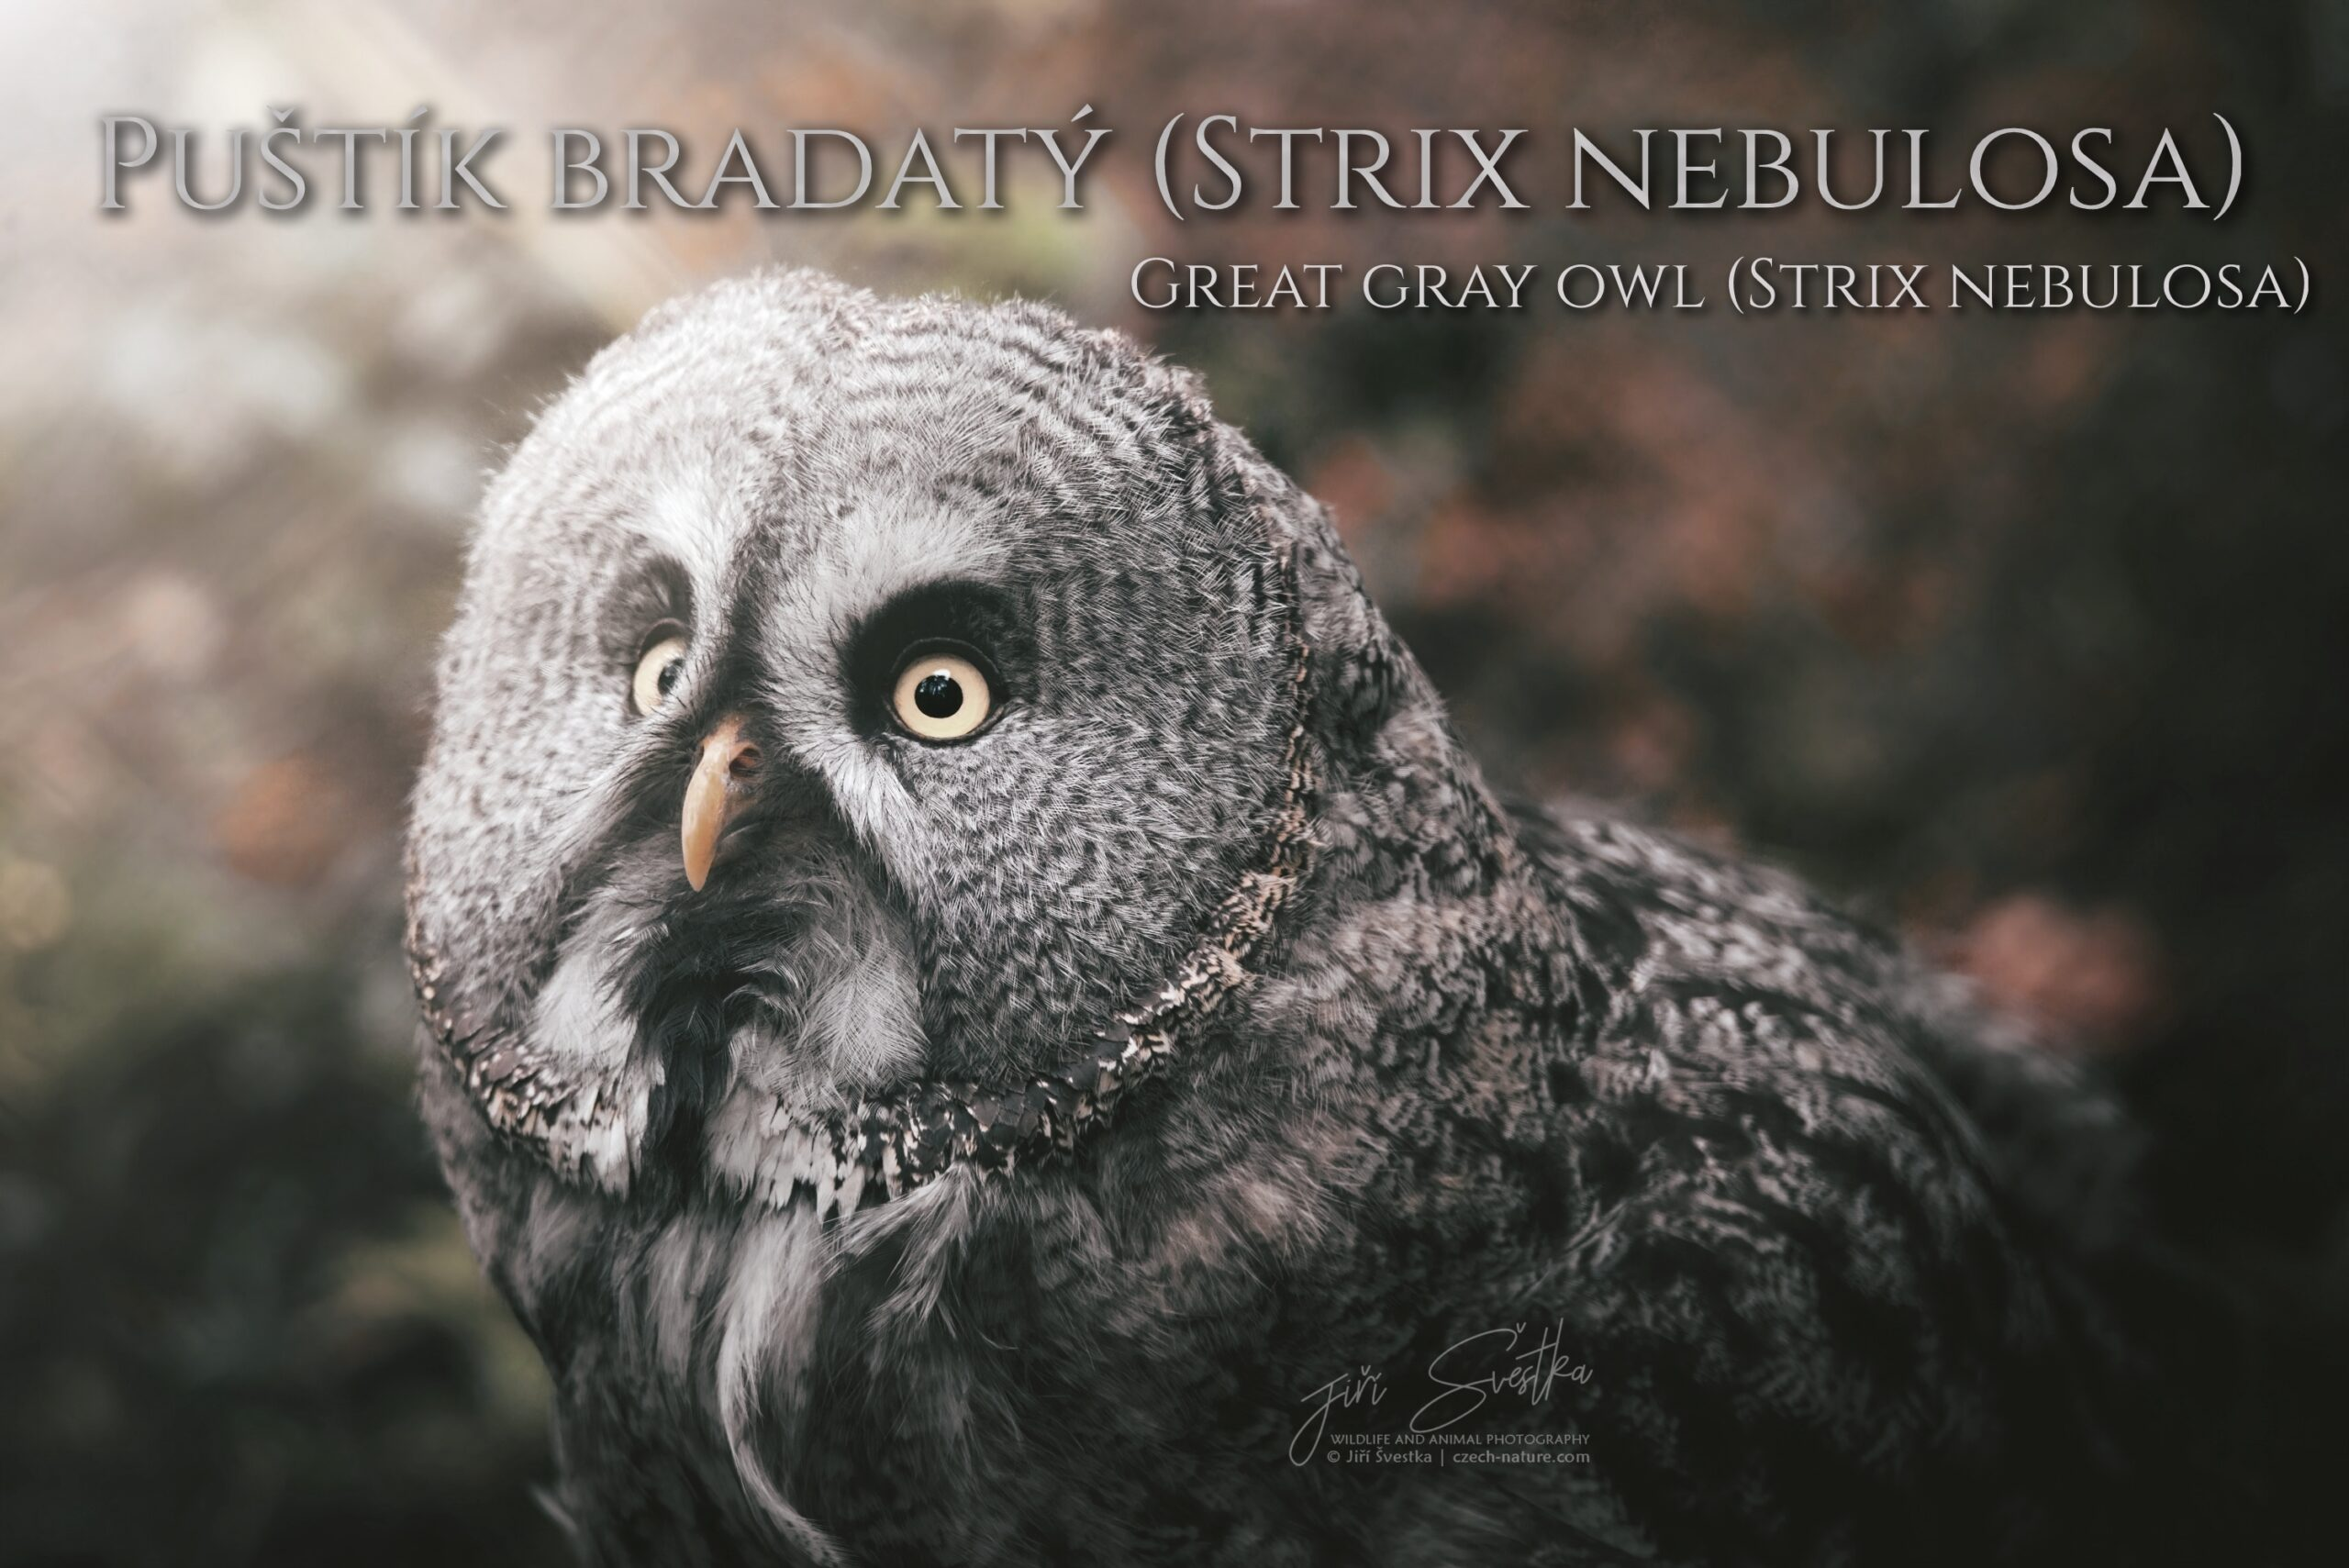 Puštík bradatý (Strix nebulosa)